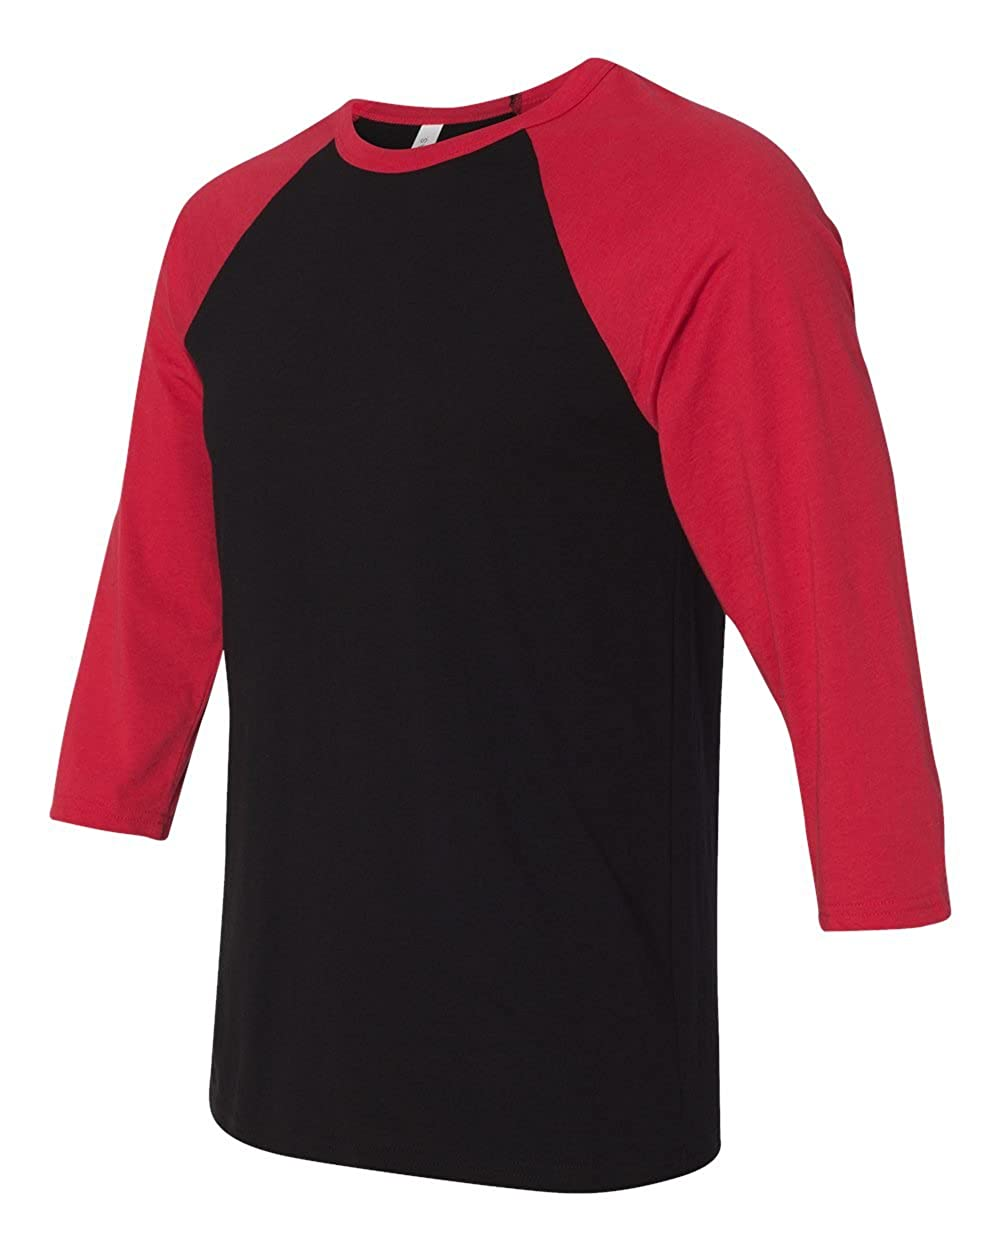 Bella Canvas Unisex Jersey 3 4 Sleeve Baseball Tee Clothing The Olive House Gantungan Baju X Hangar